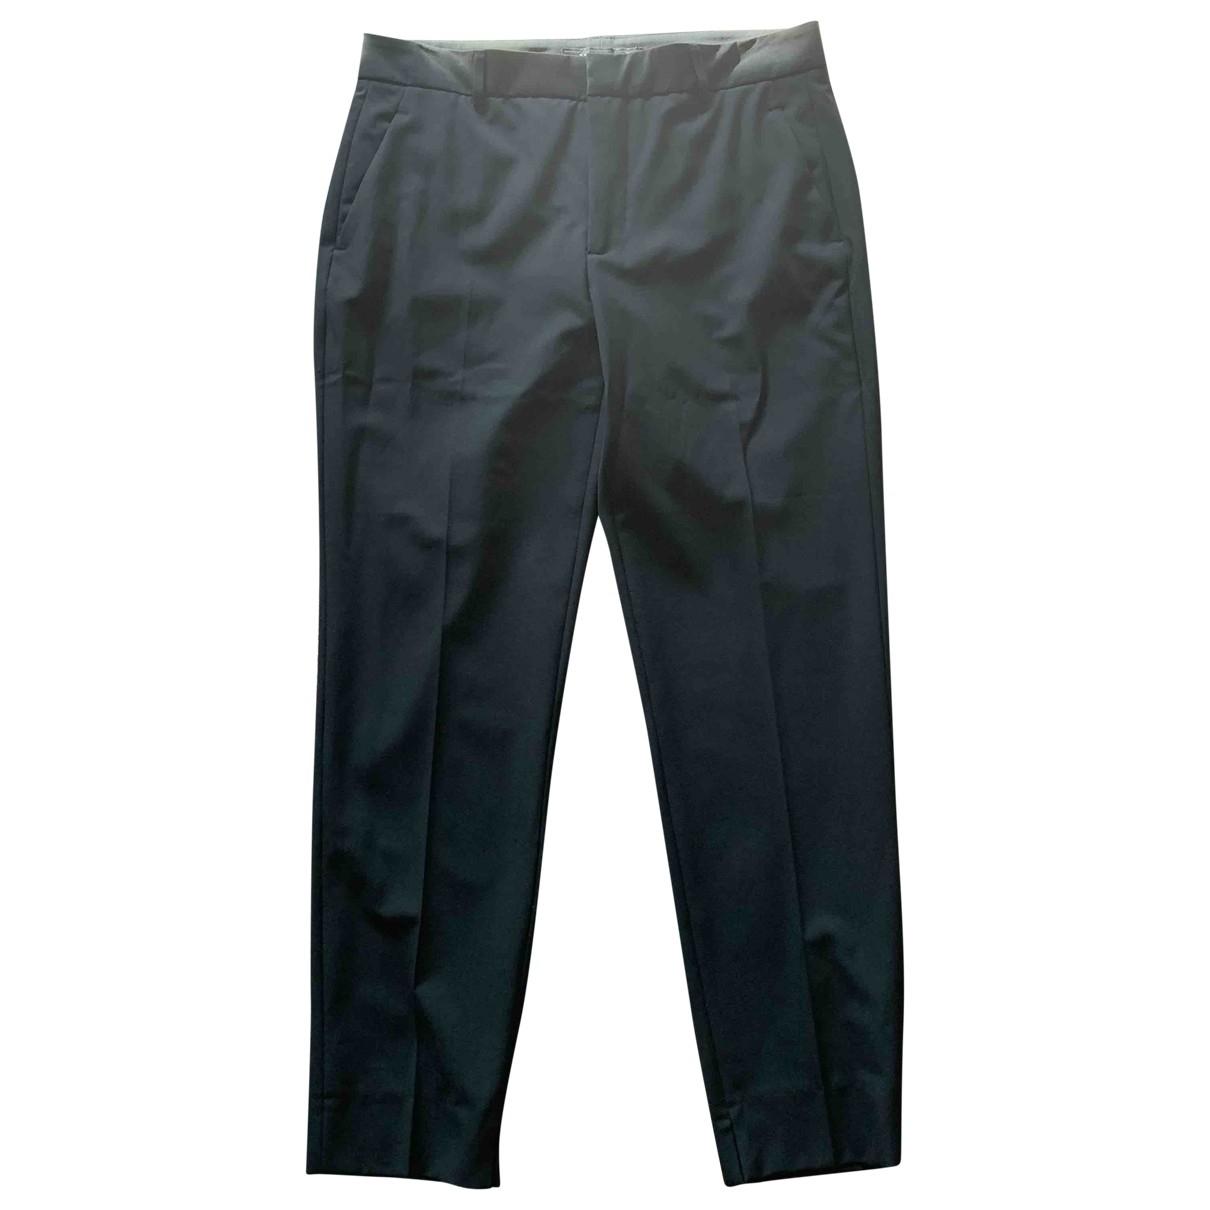 Zara \N Black Trousers for Women L International